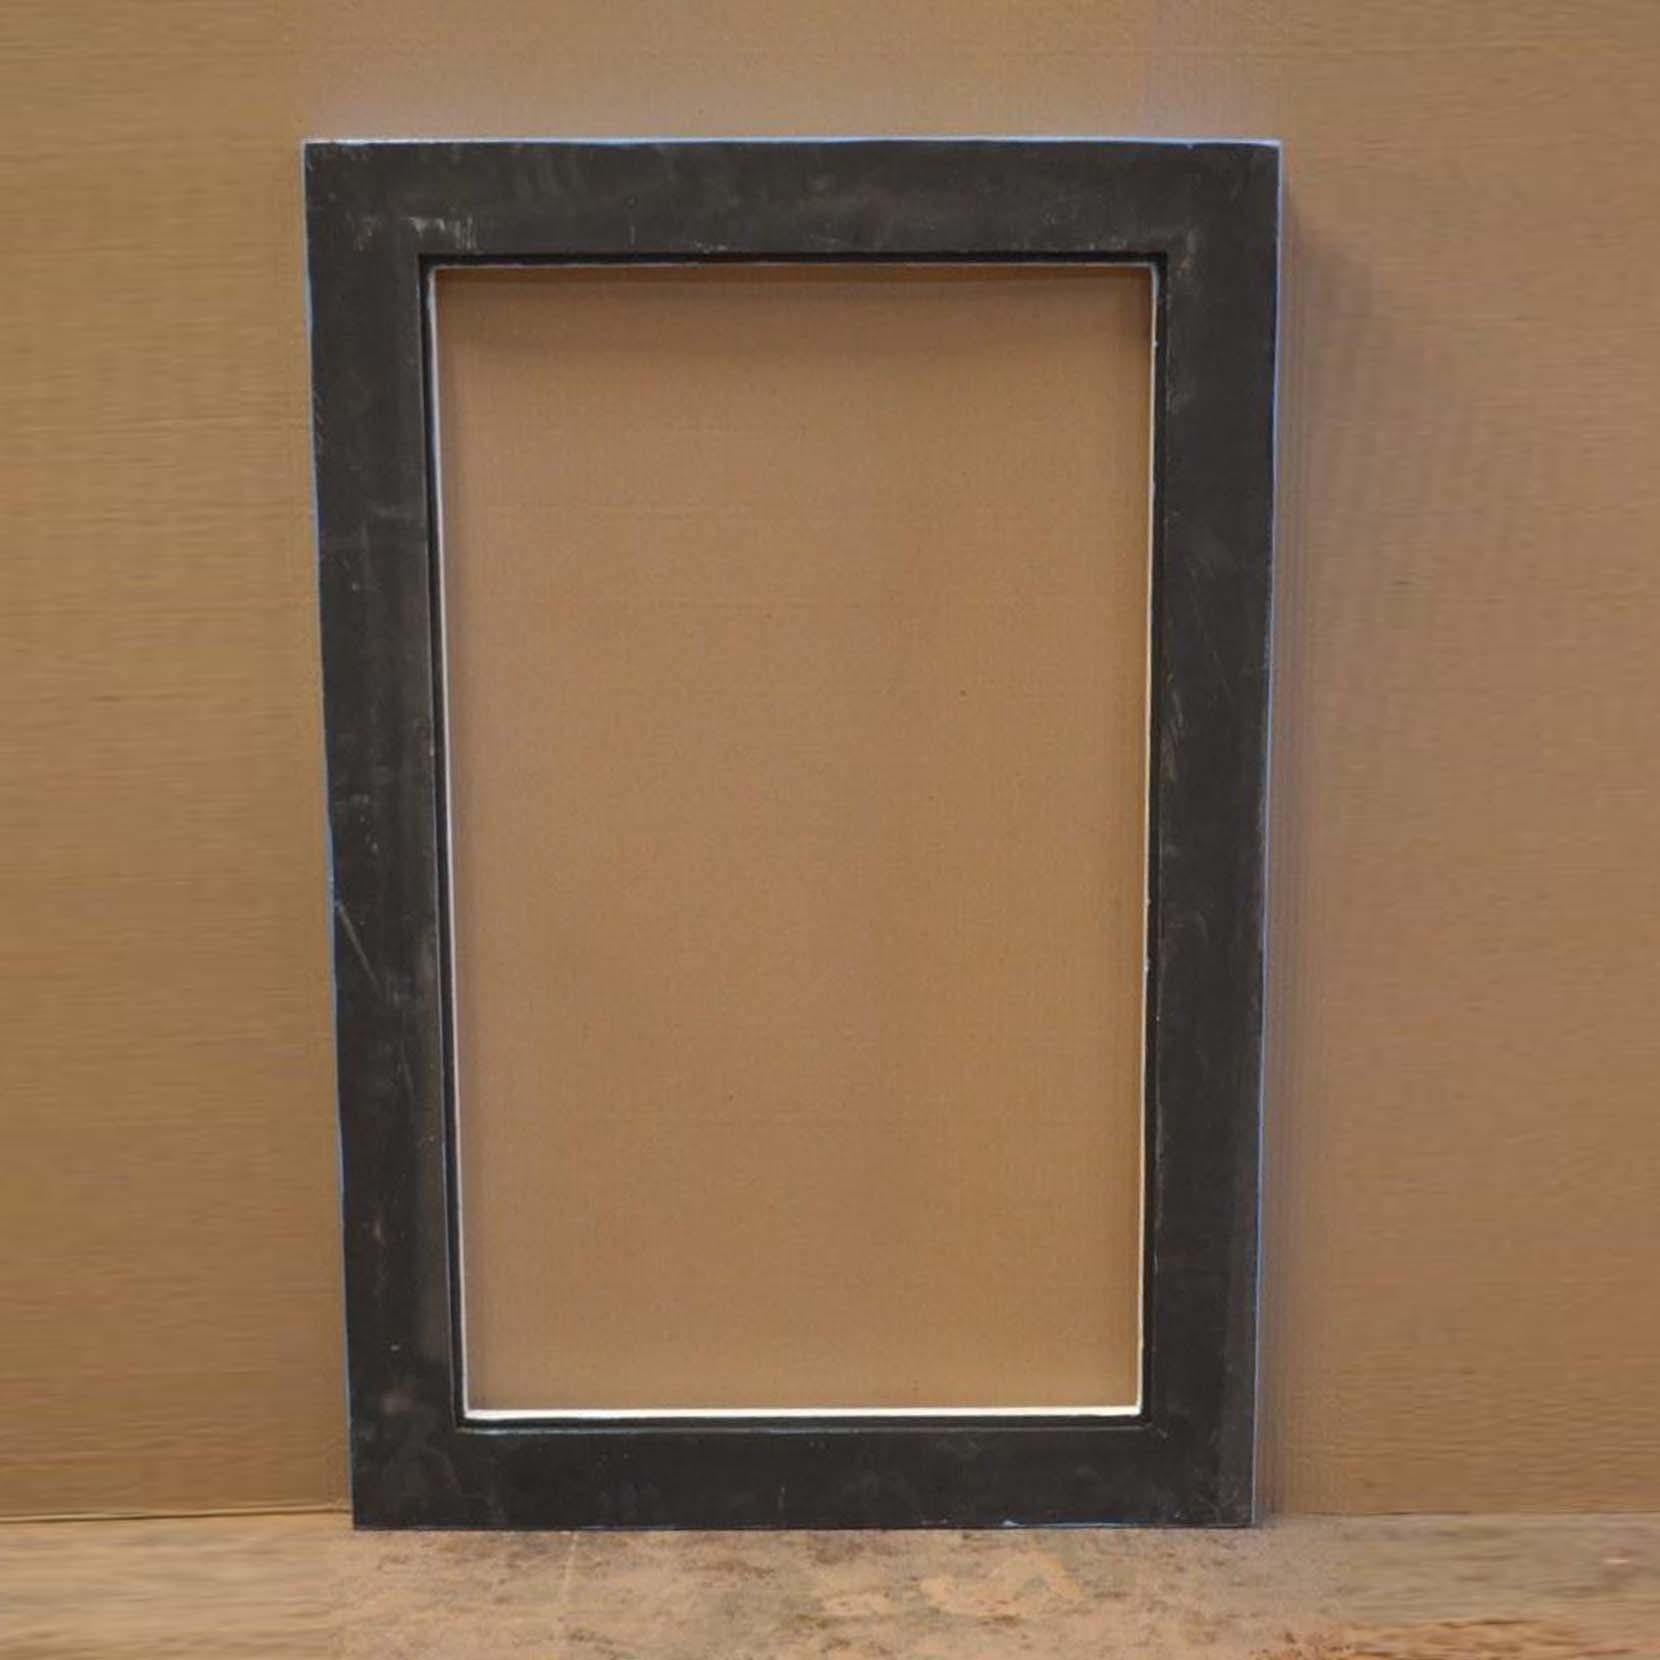 pandora bone inlay hand painted mirror frame